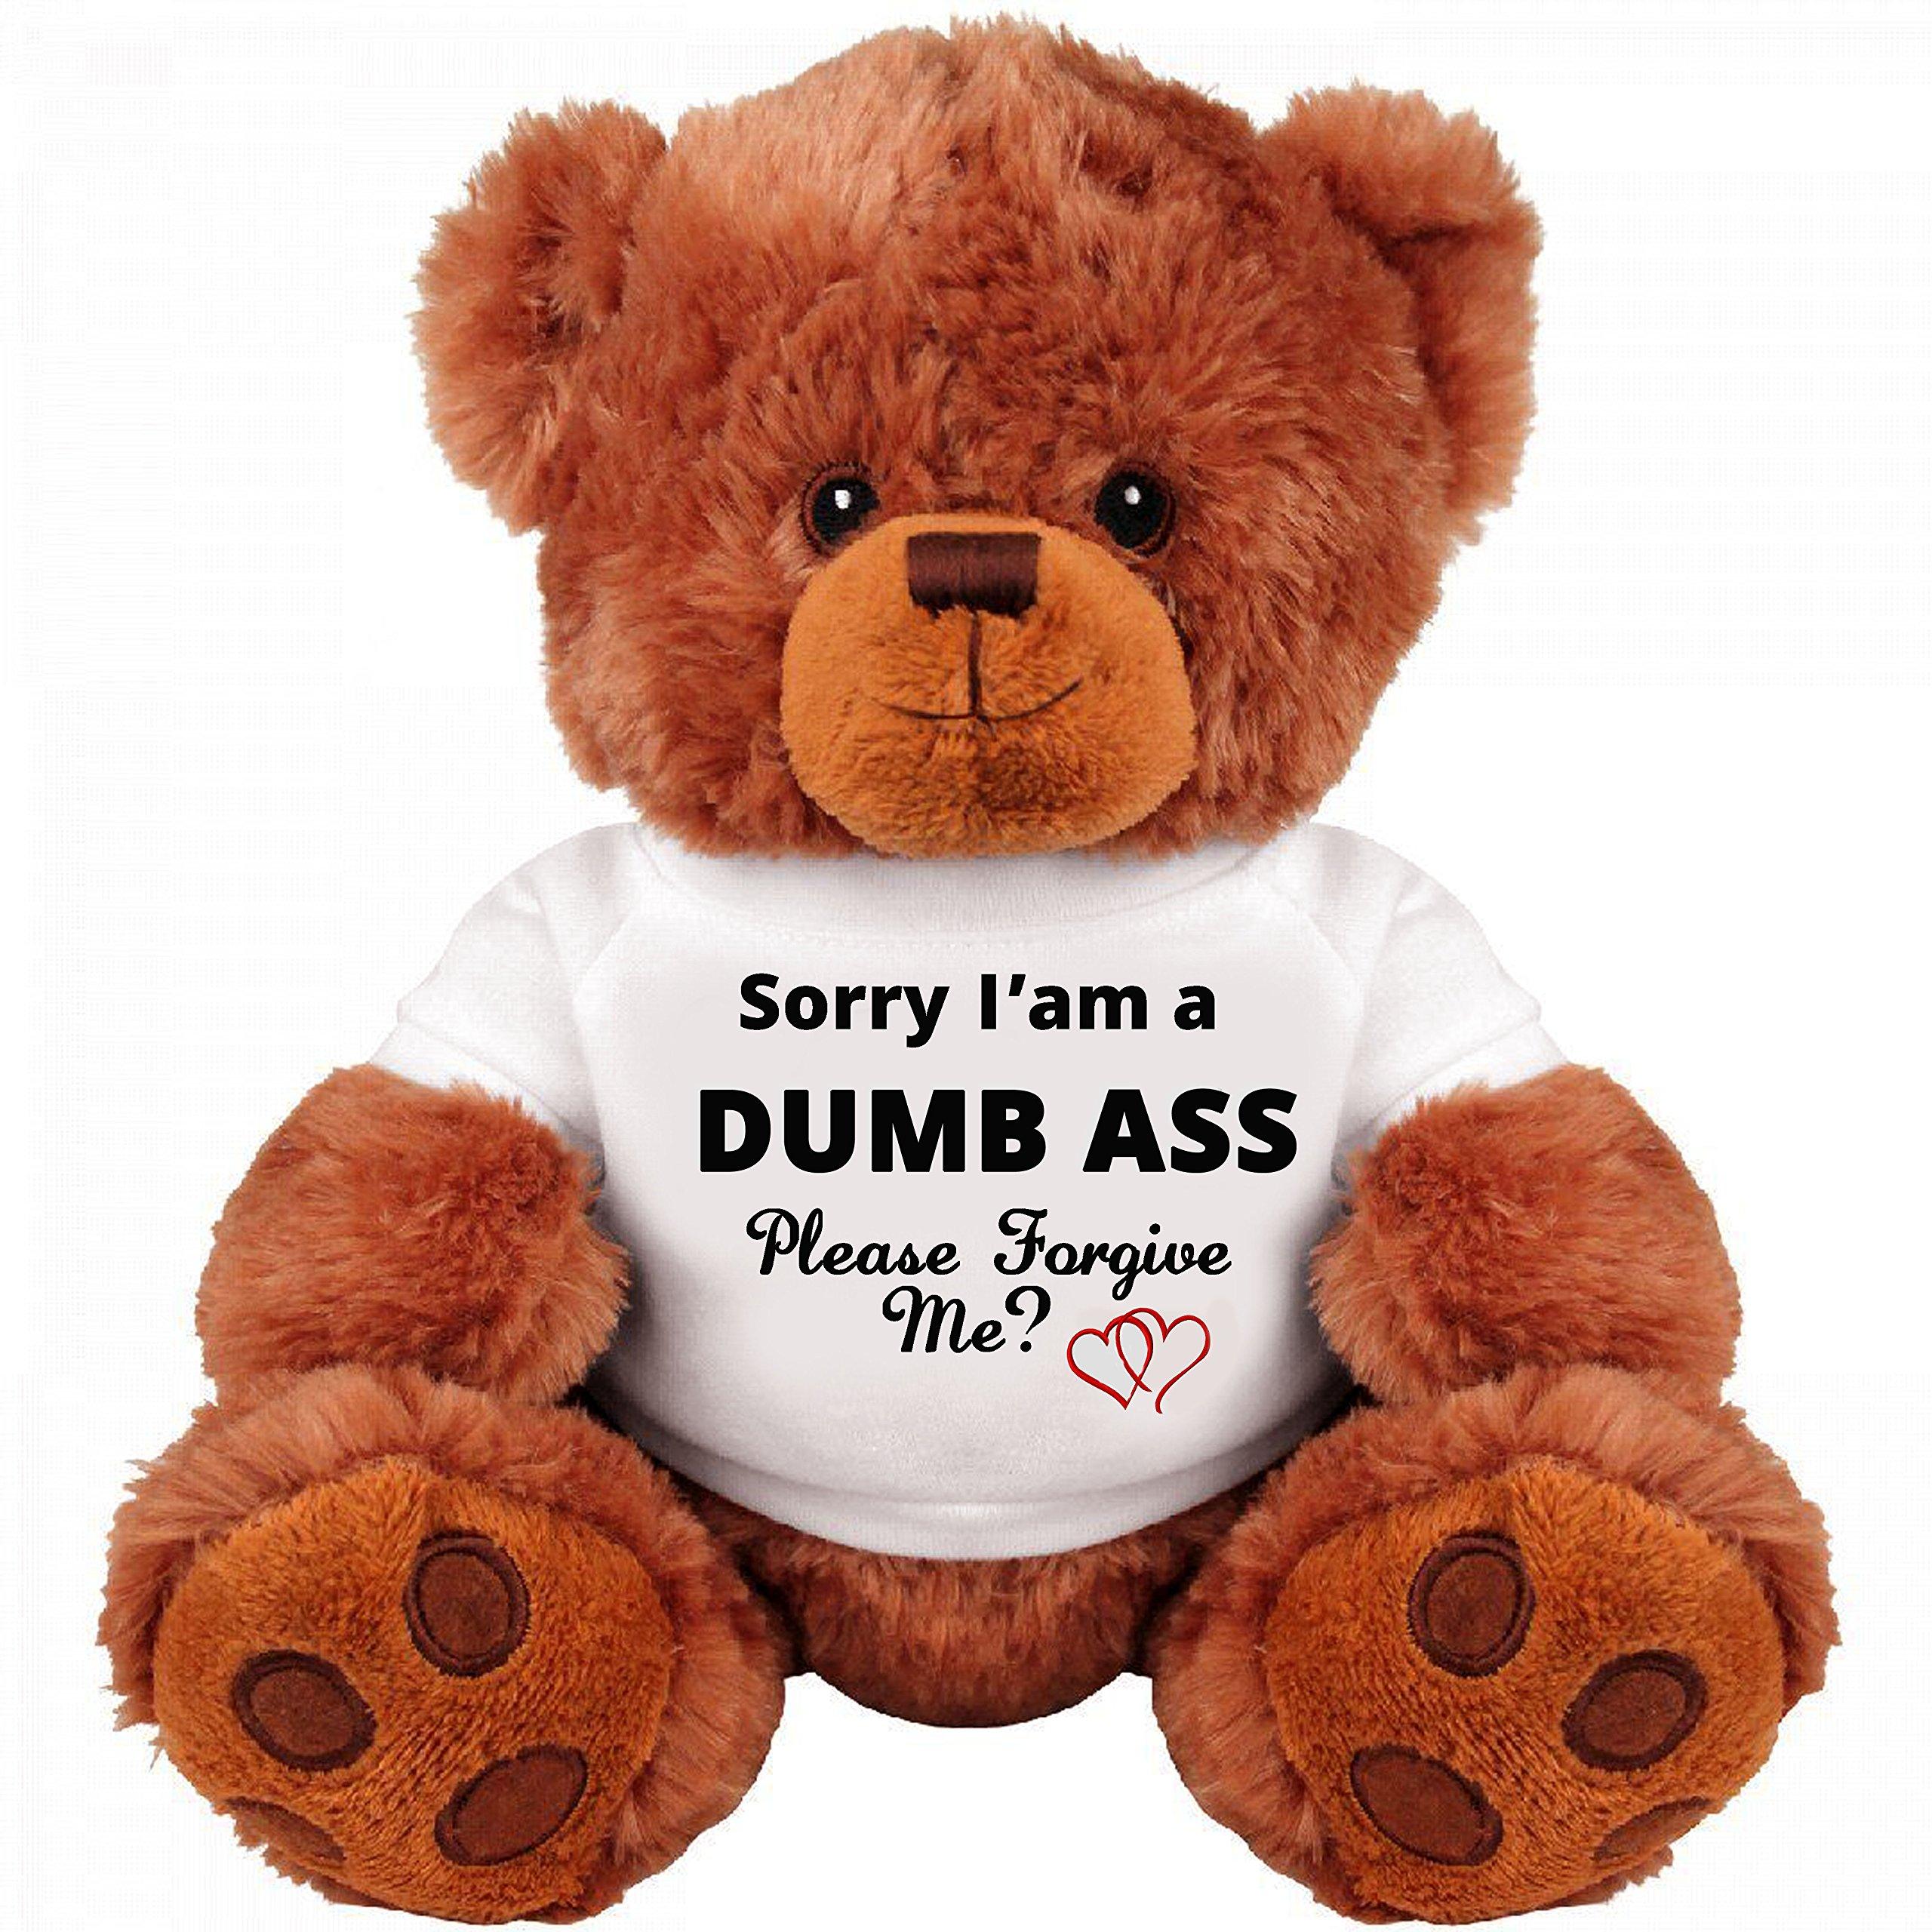 caff913c663 Amazon.com  Sorry and Forgive Me Gift  Funny Teddy Bear Couple Gift  Medium Teddy  Bear Stuffed Animal  Toys   Games